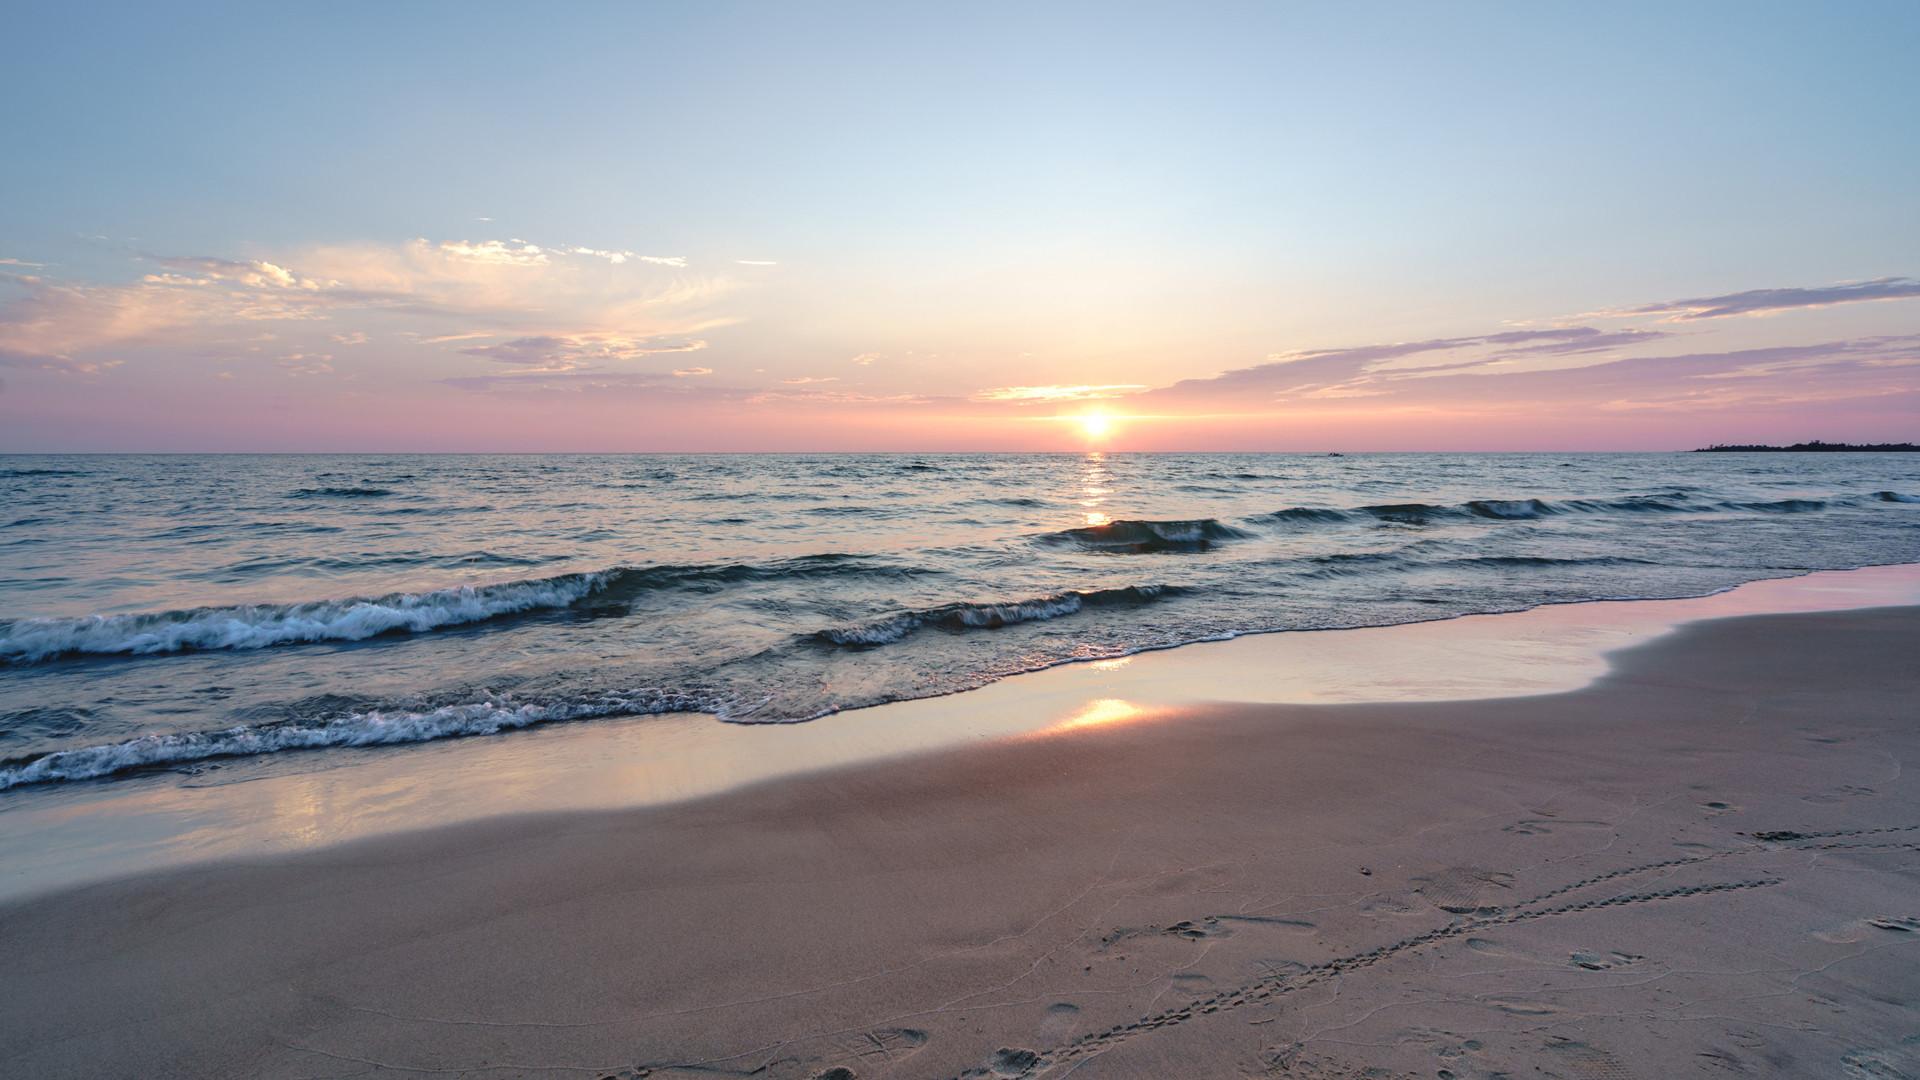 Breathtaking Ontario beaches | A sunset over Sauble Beach